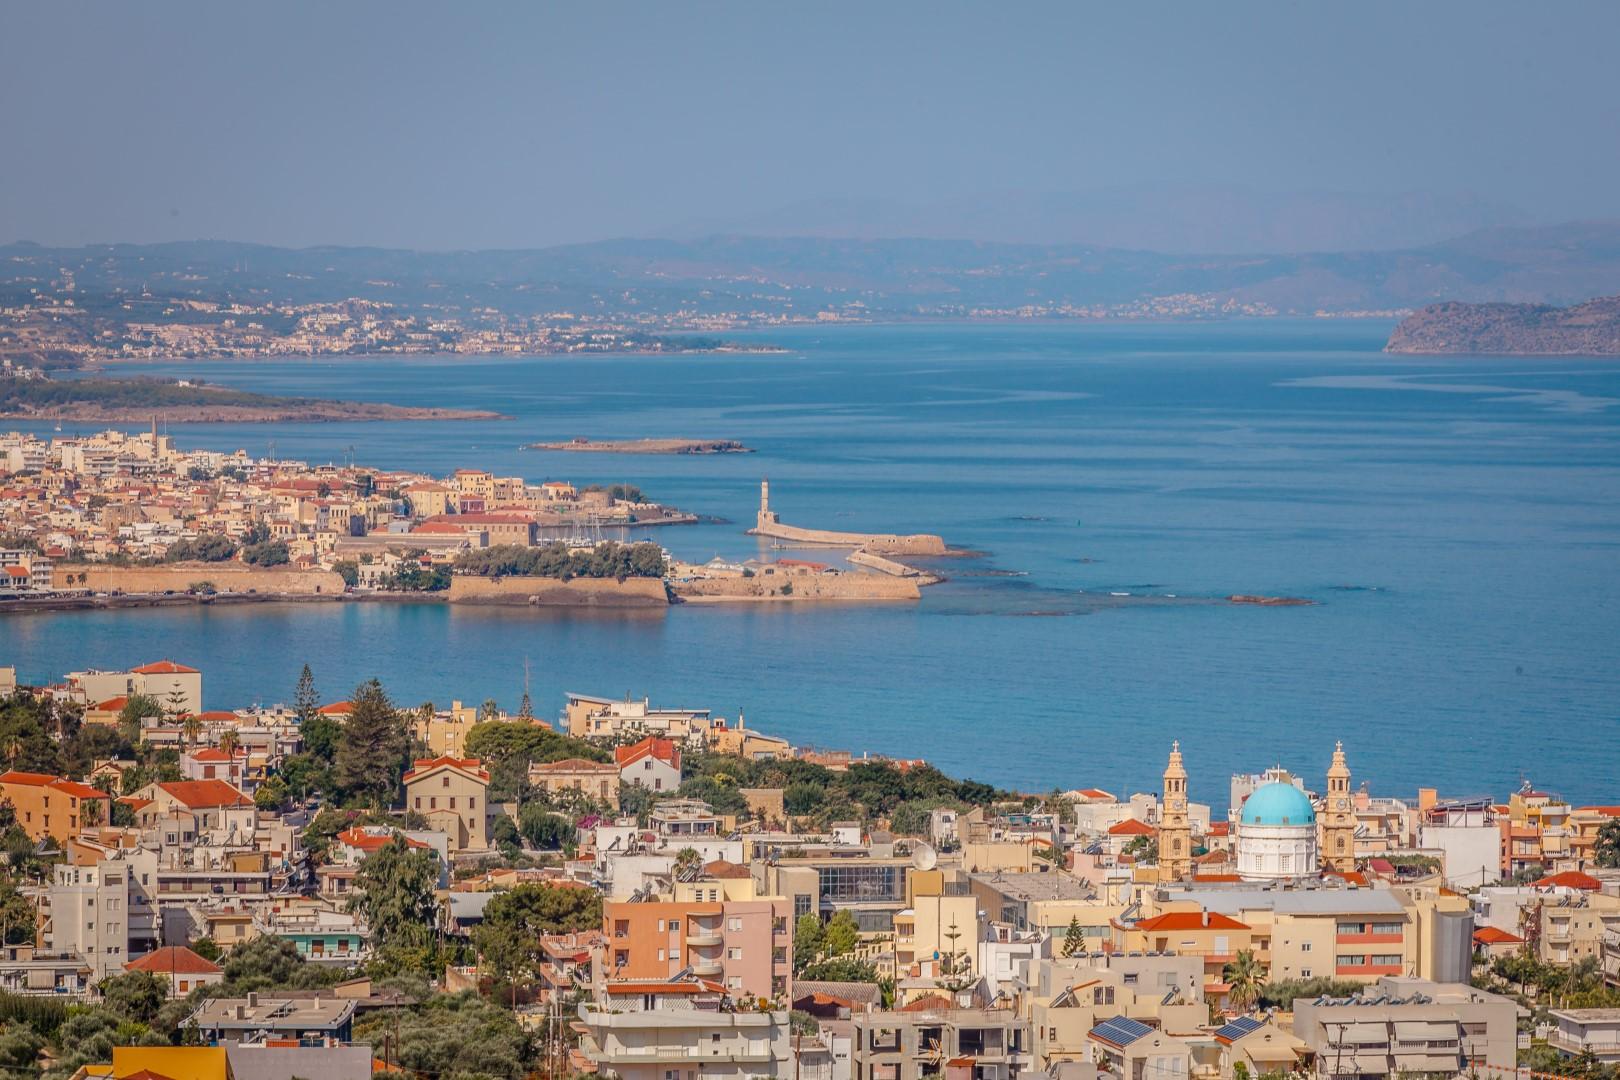 European Best Destinations ανακοίνωσαν τους καλύτερους προορισμούς για εμβολιασμένους τουρίστες: η Ελλάδα είναι στη λίστα